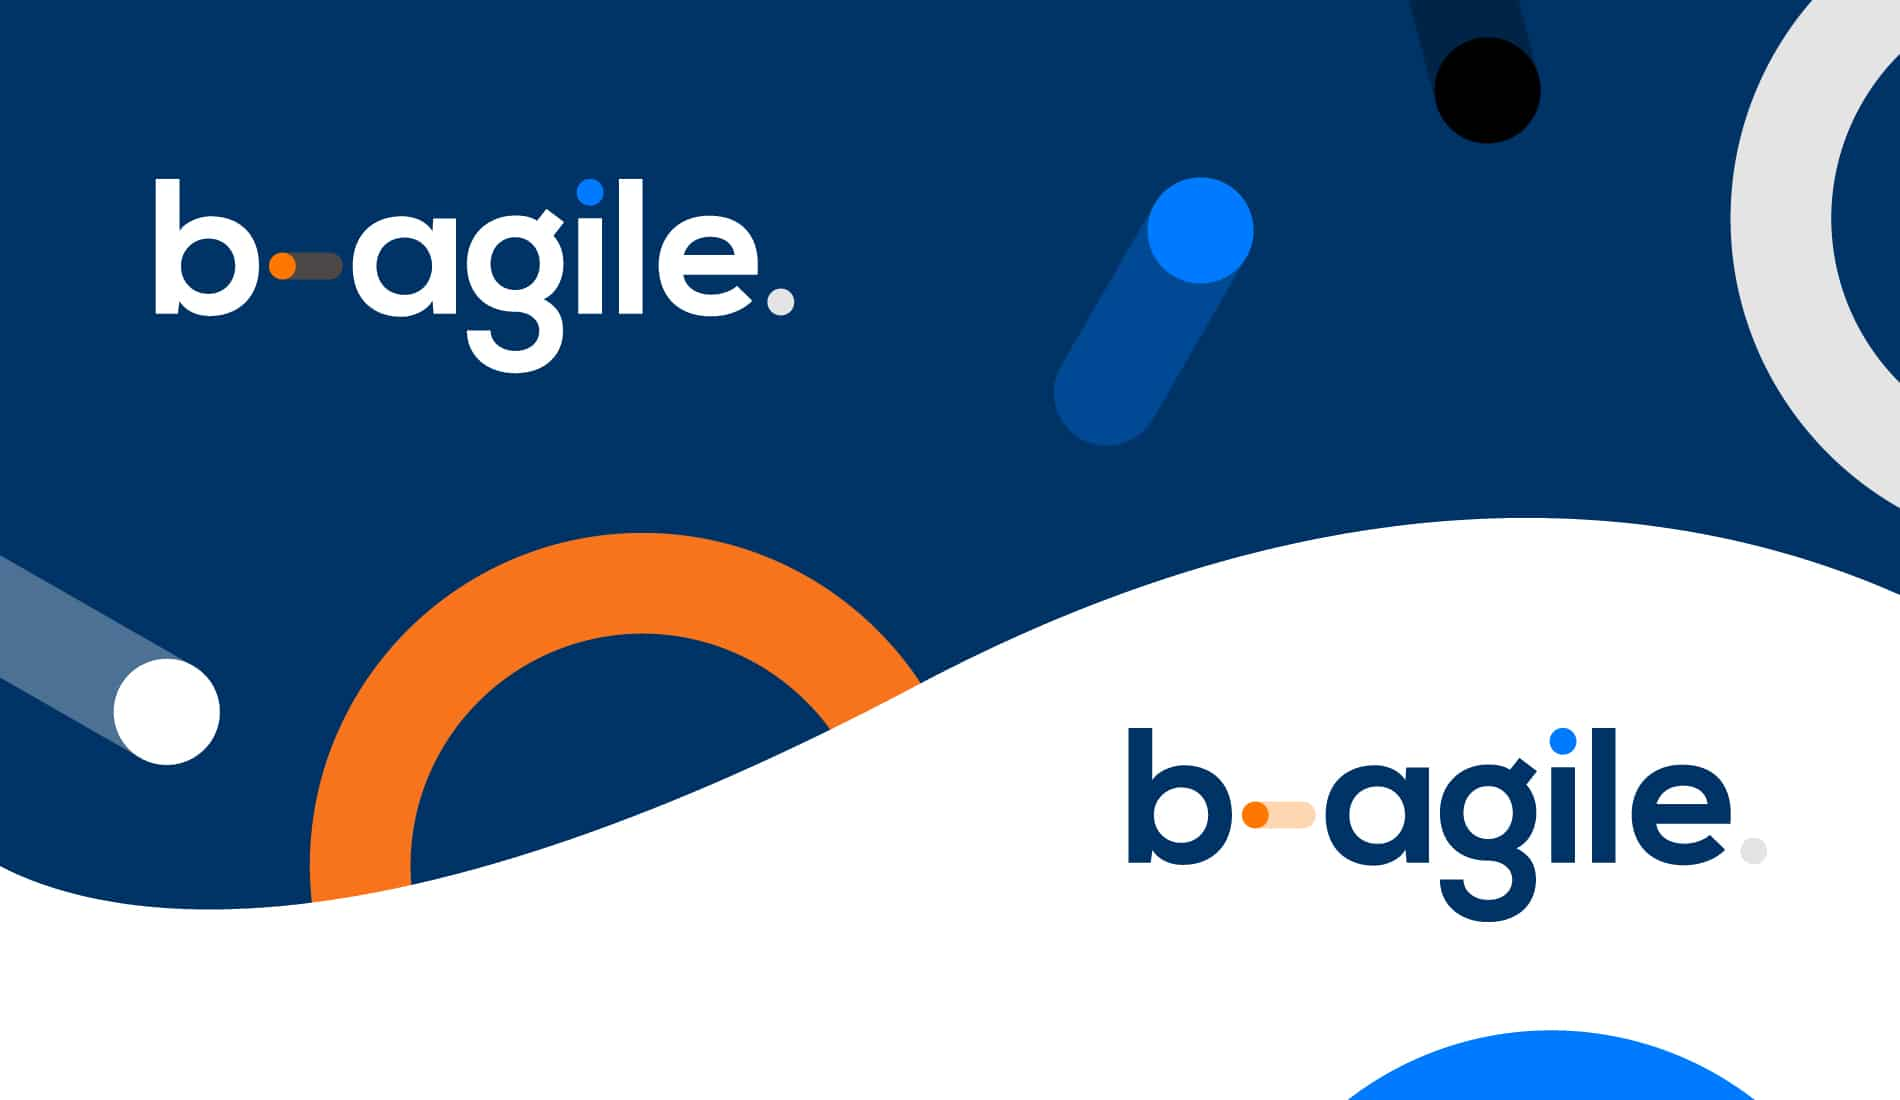 Bagile logos on background